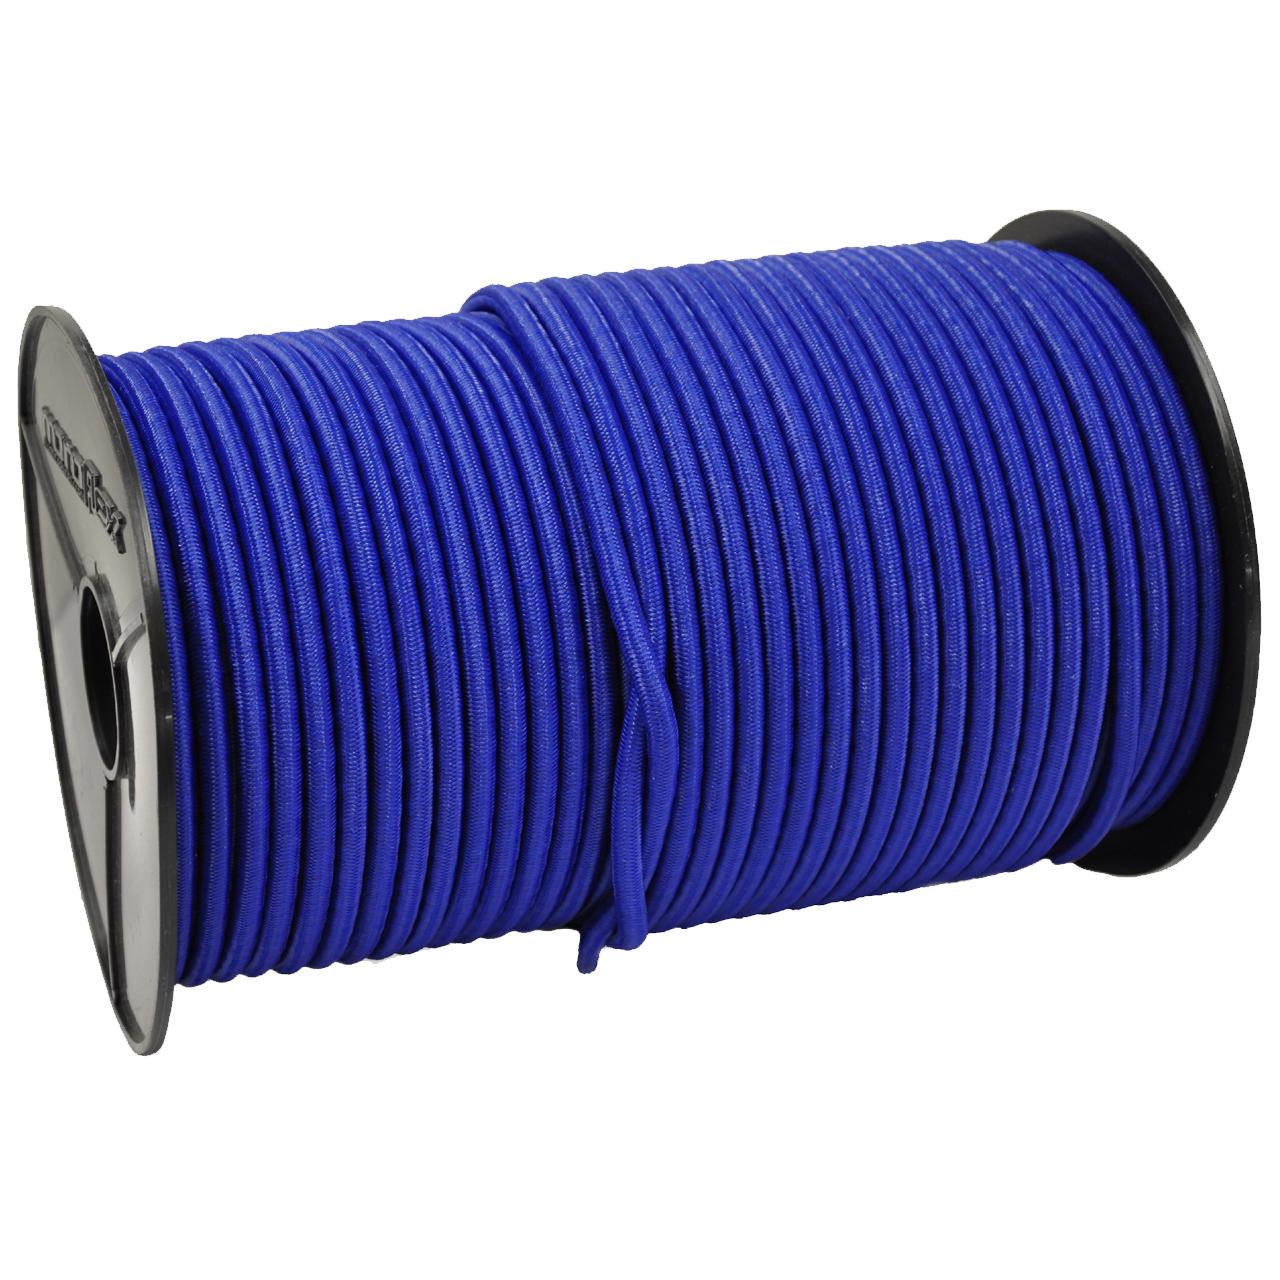 SCHNURHAUS - Monoflex Expanderseil mit Polyethylen (PE) Mantel rot